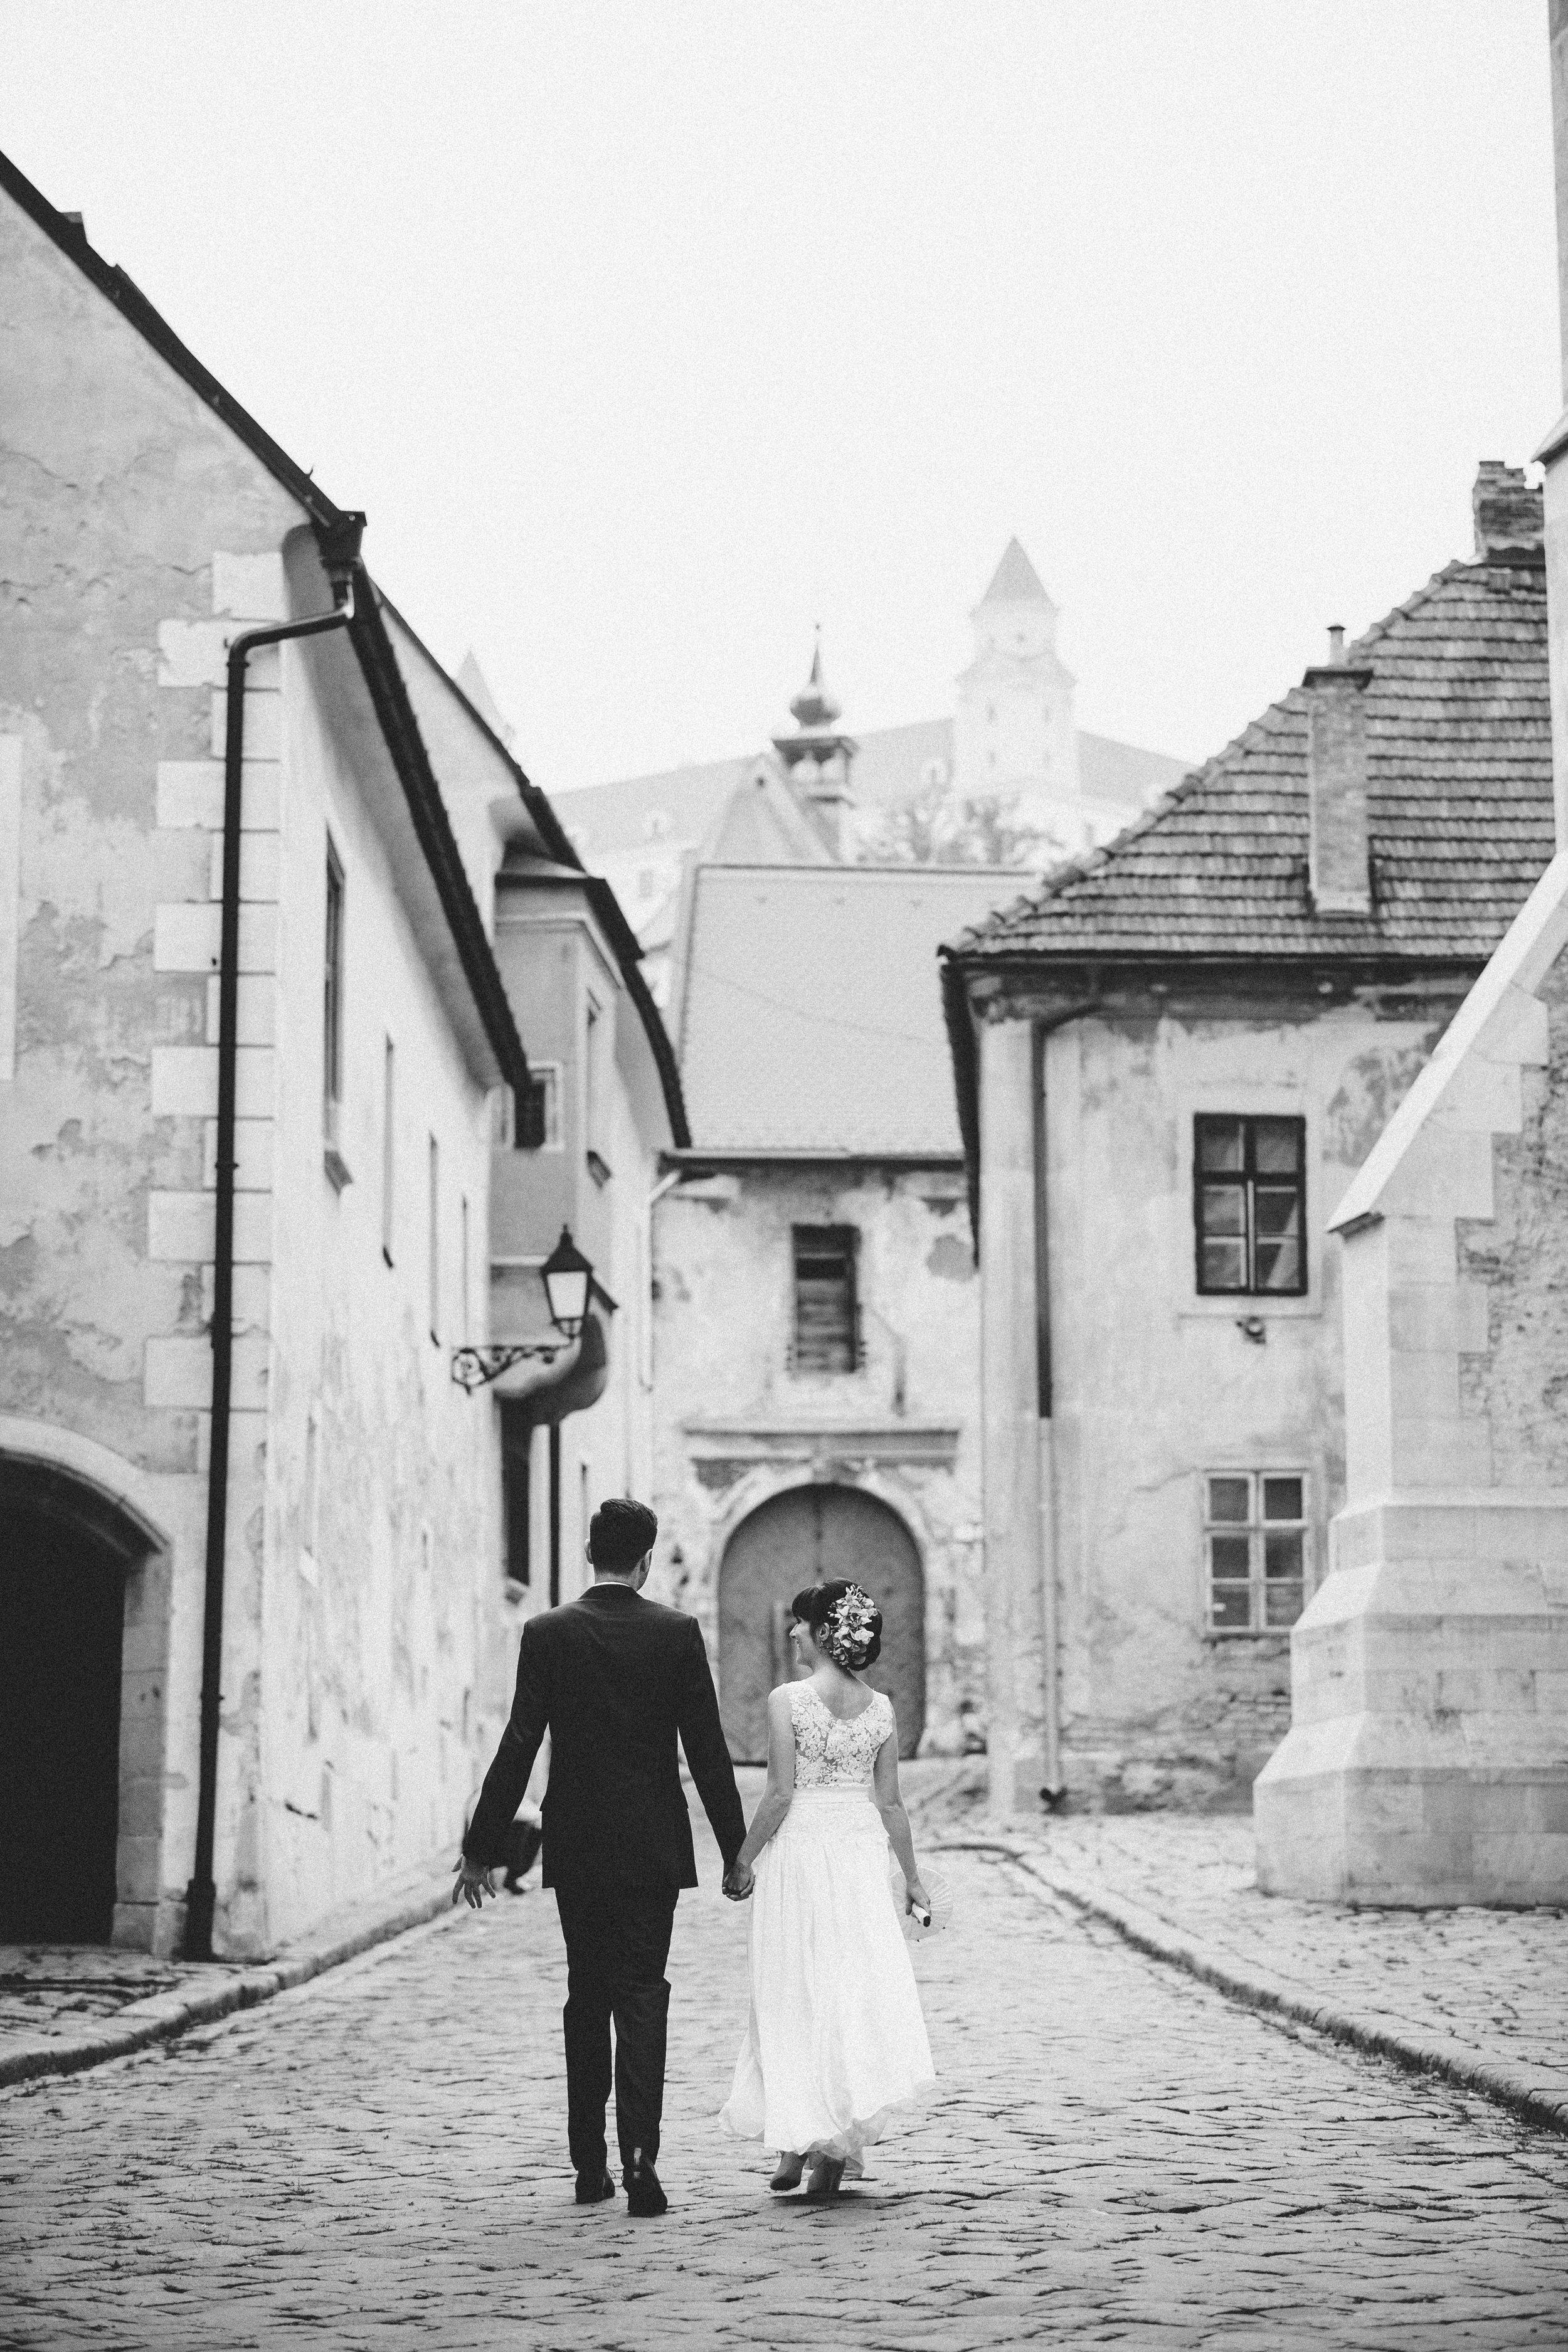 destination-wedding-photographer-bratislava-slovakia-europe-portrait-session-bride-groom-bw-documentary.jpg